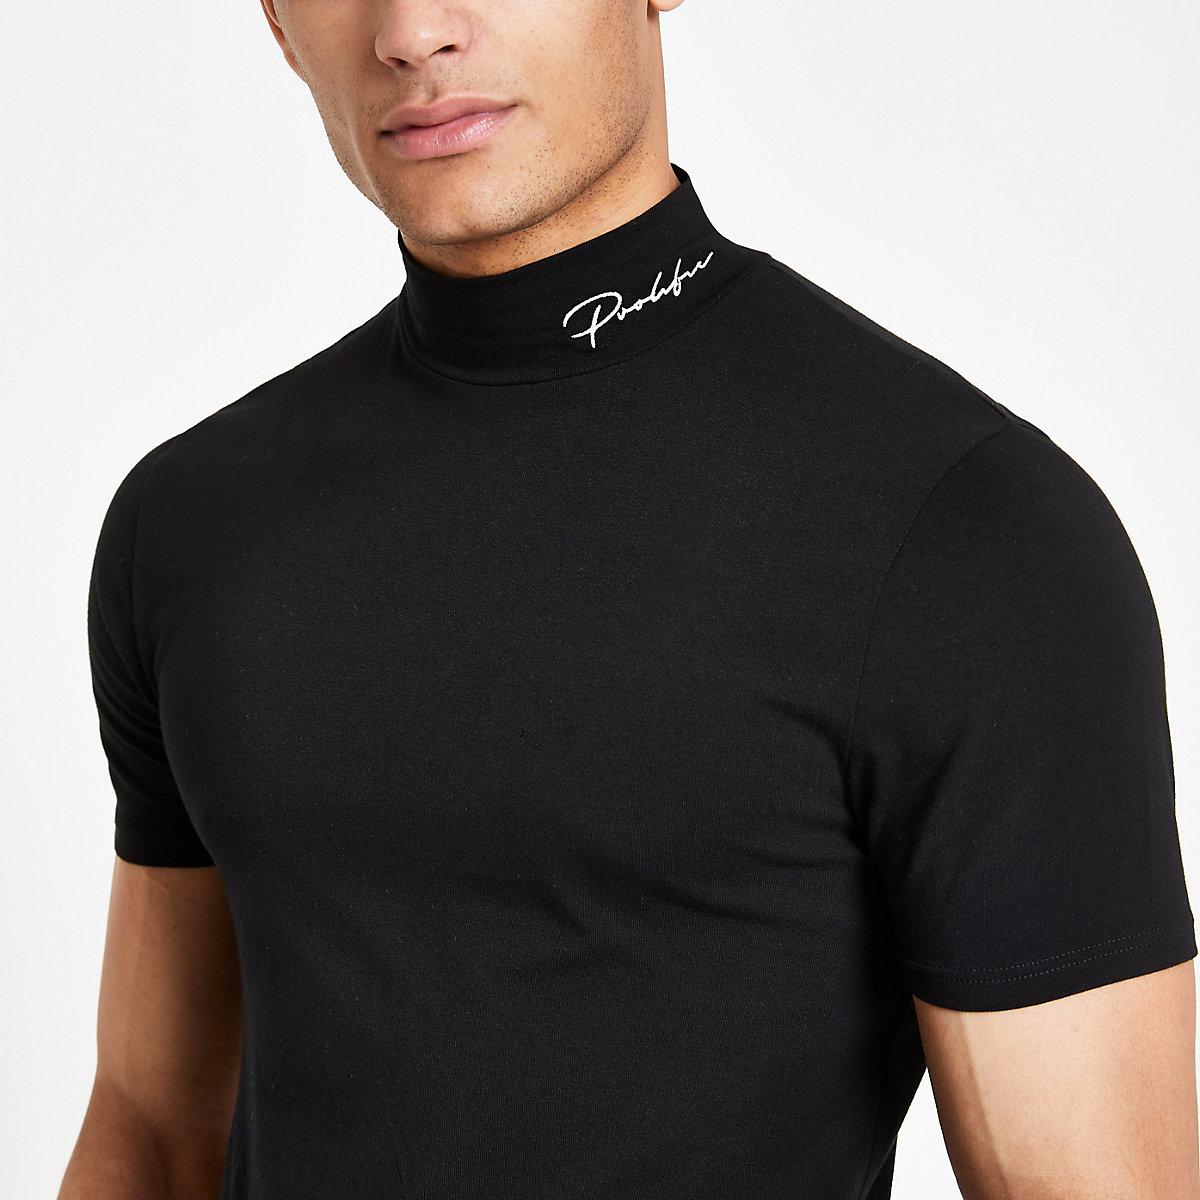 Black 'Prolific' muscle turtle neck T-shirt